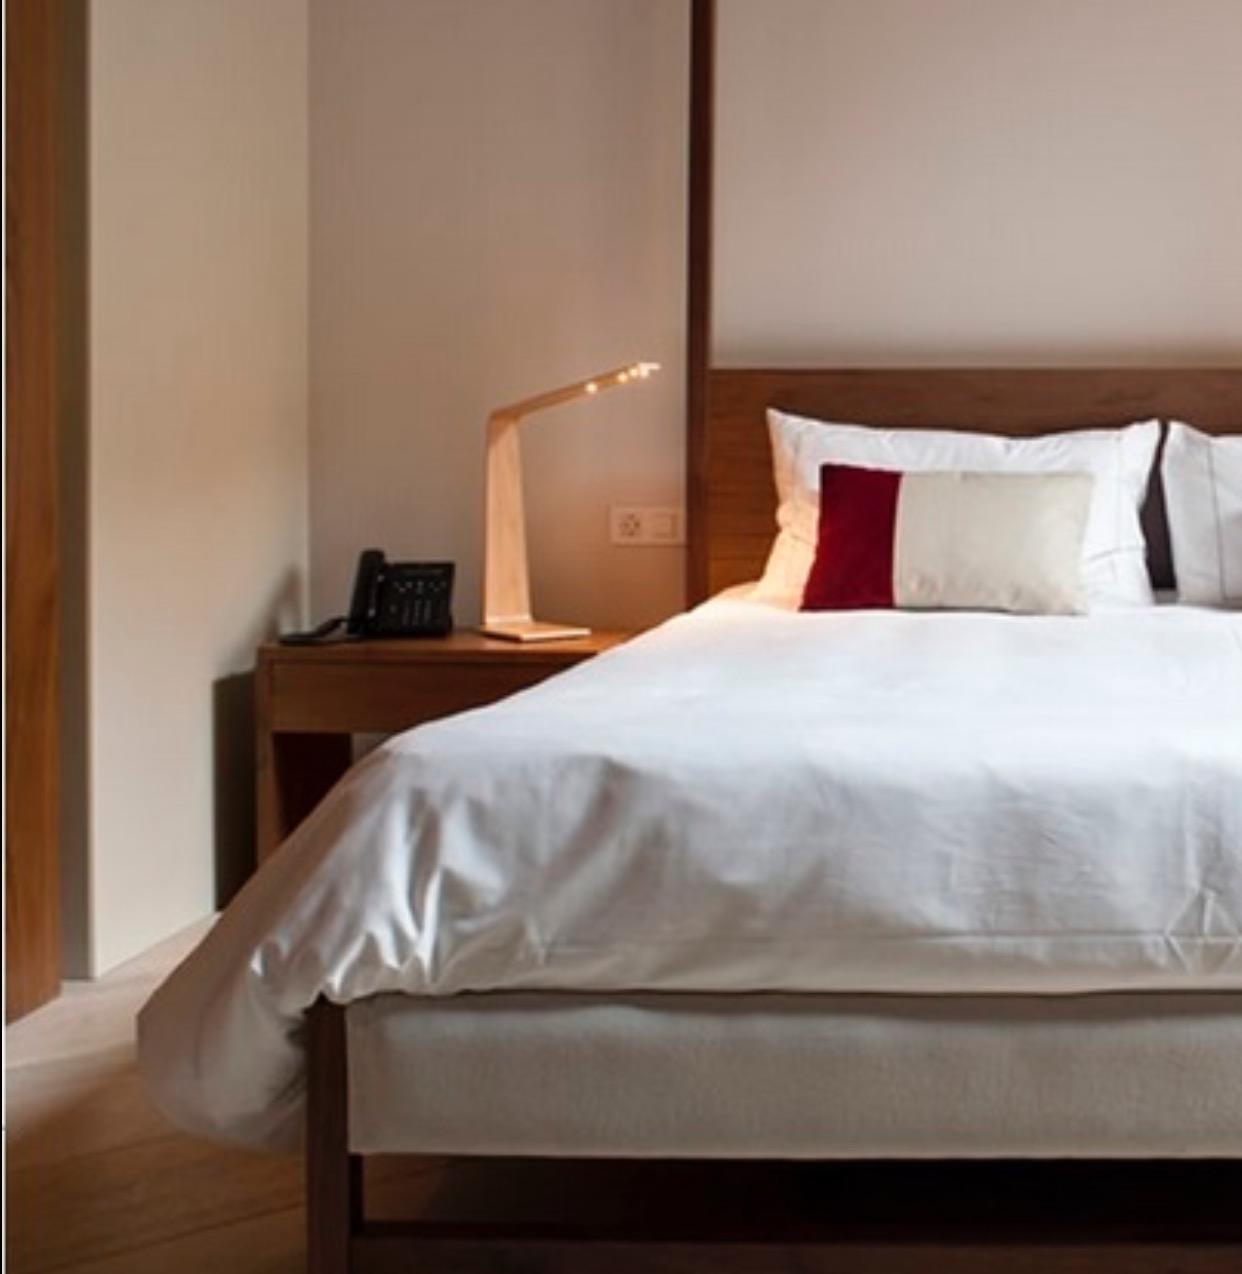 lampe poser led4 bouleau 2700k h52cm tunto. Black Bedroom Furniture Sets. Home Design Ideas